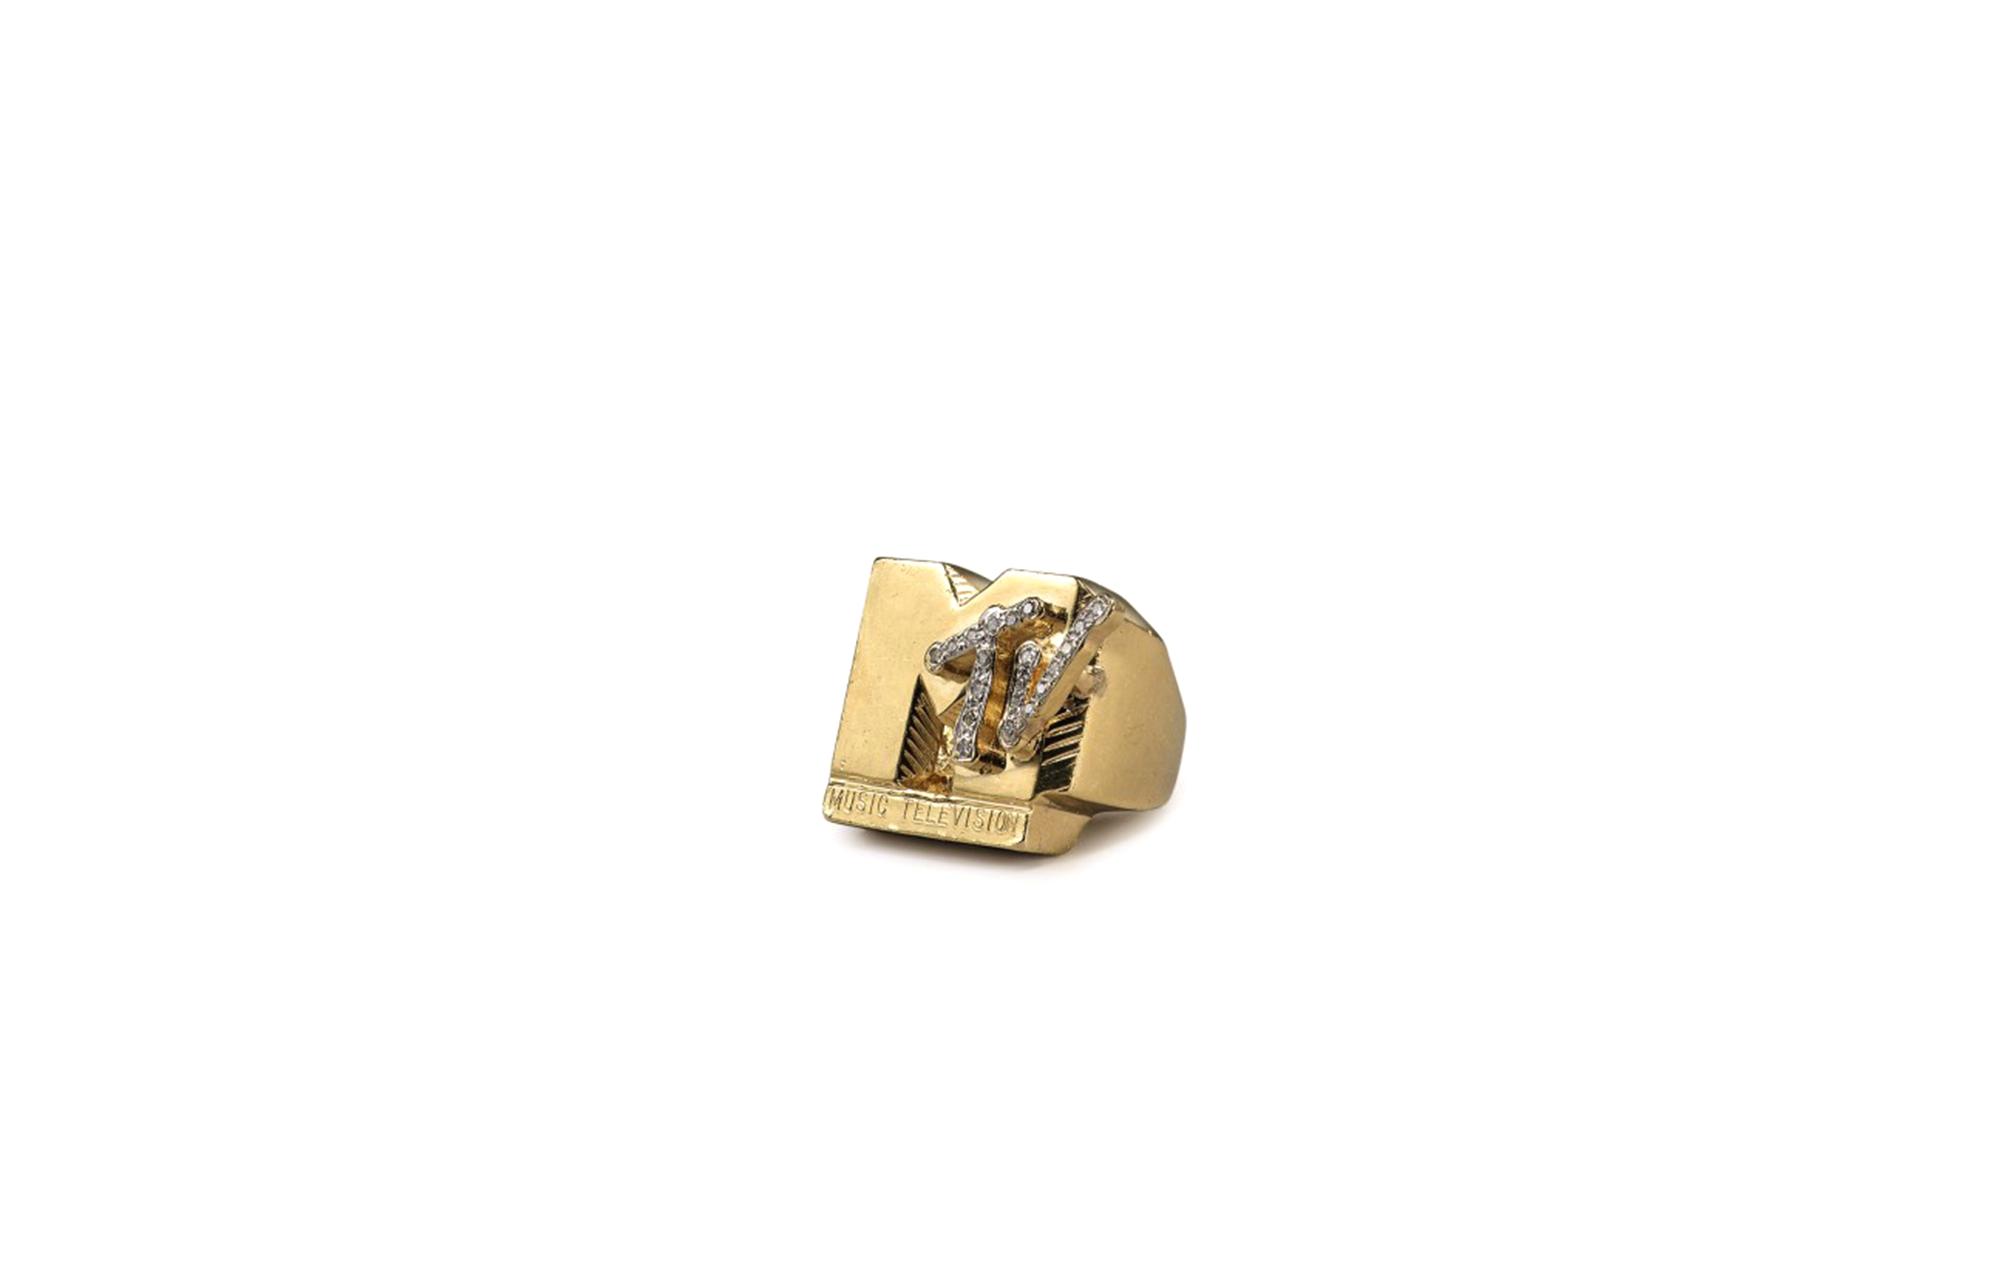 Кольцо «MTV» Fab 5 Freddy - хип-хоп-аукцион Sotheby's